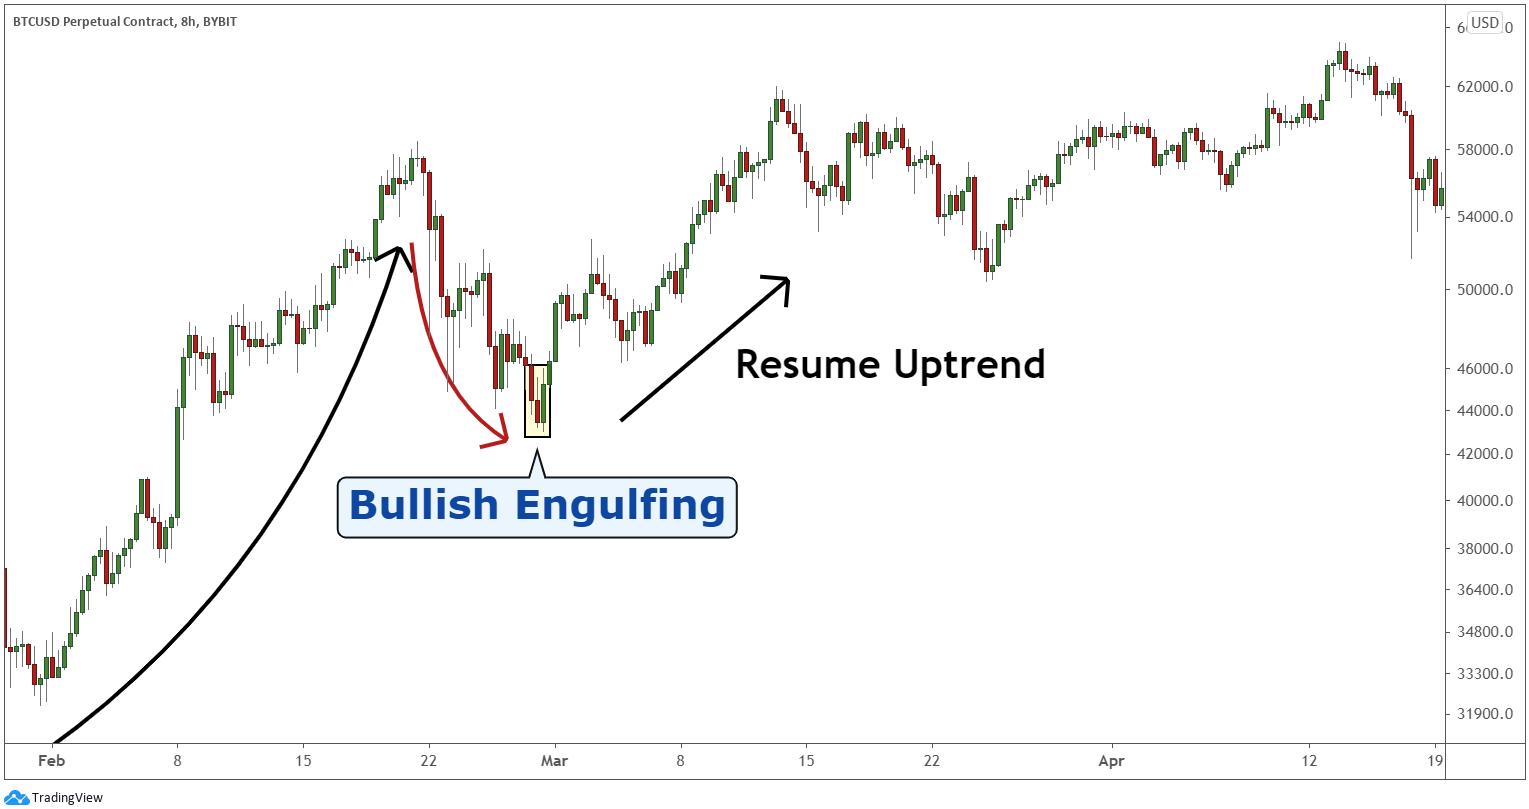 When does bullish engulfing appear?